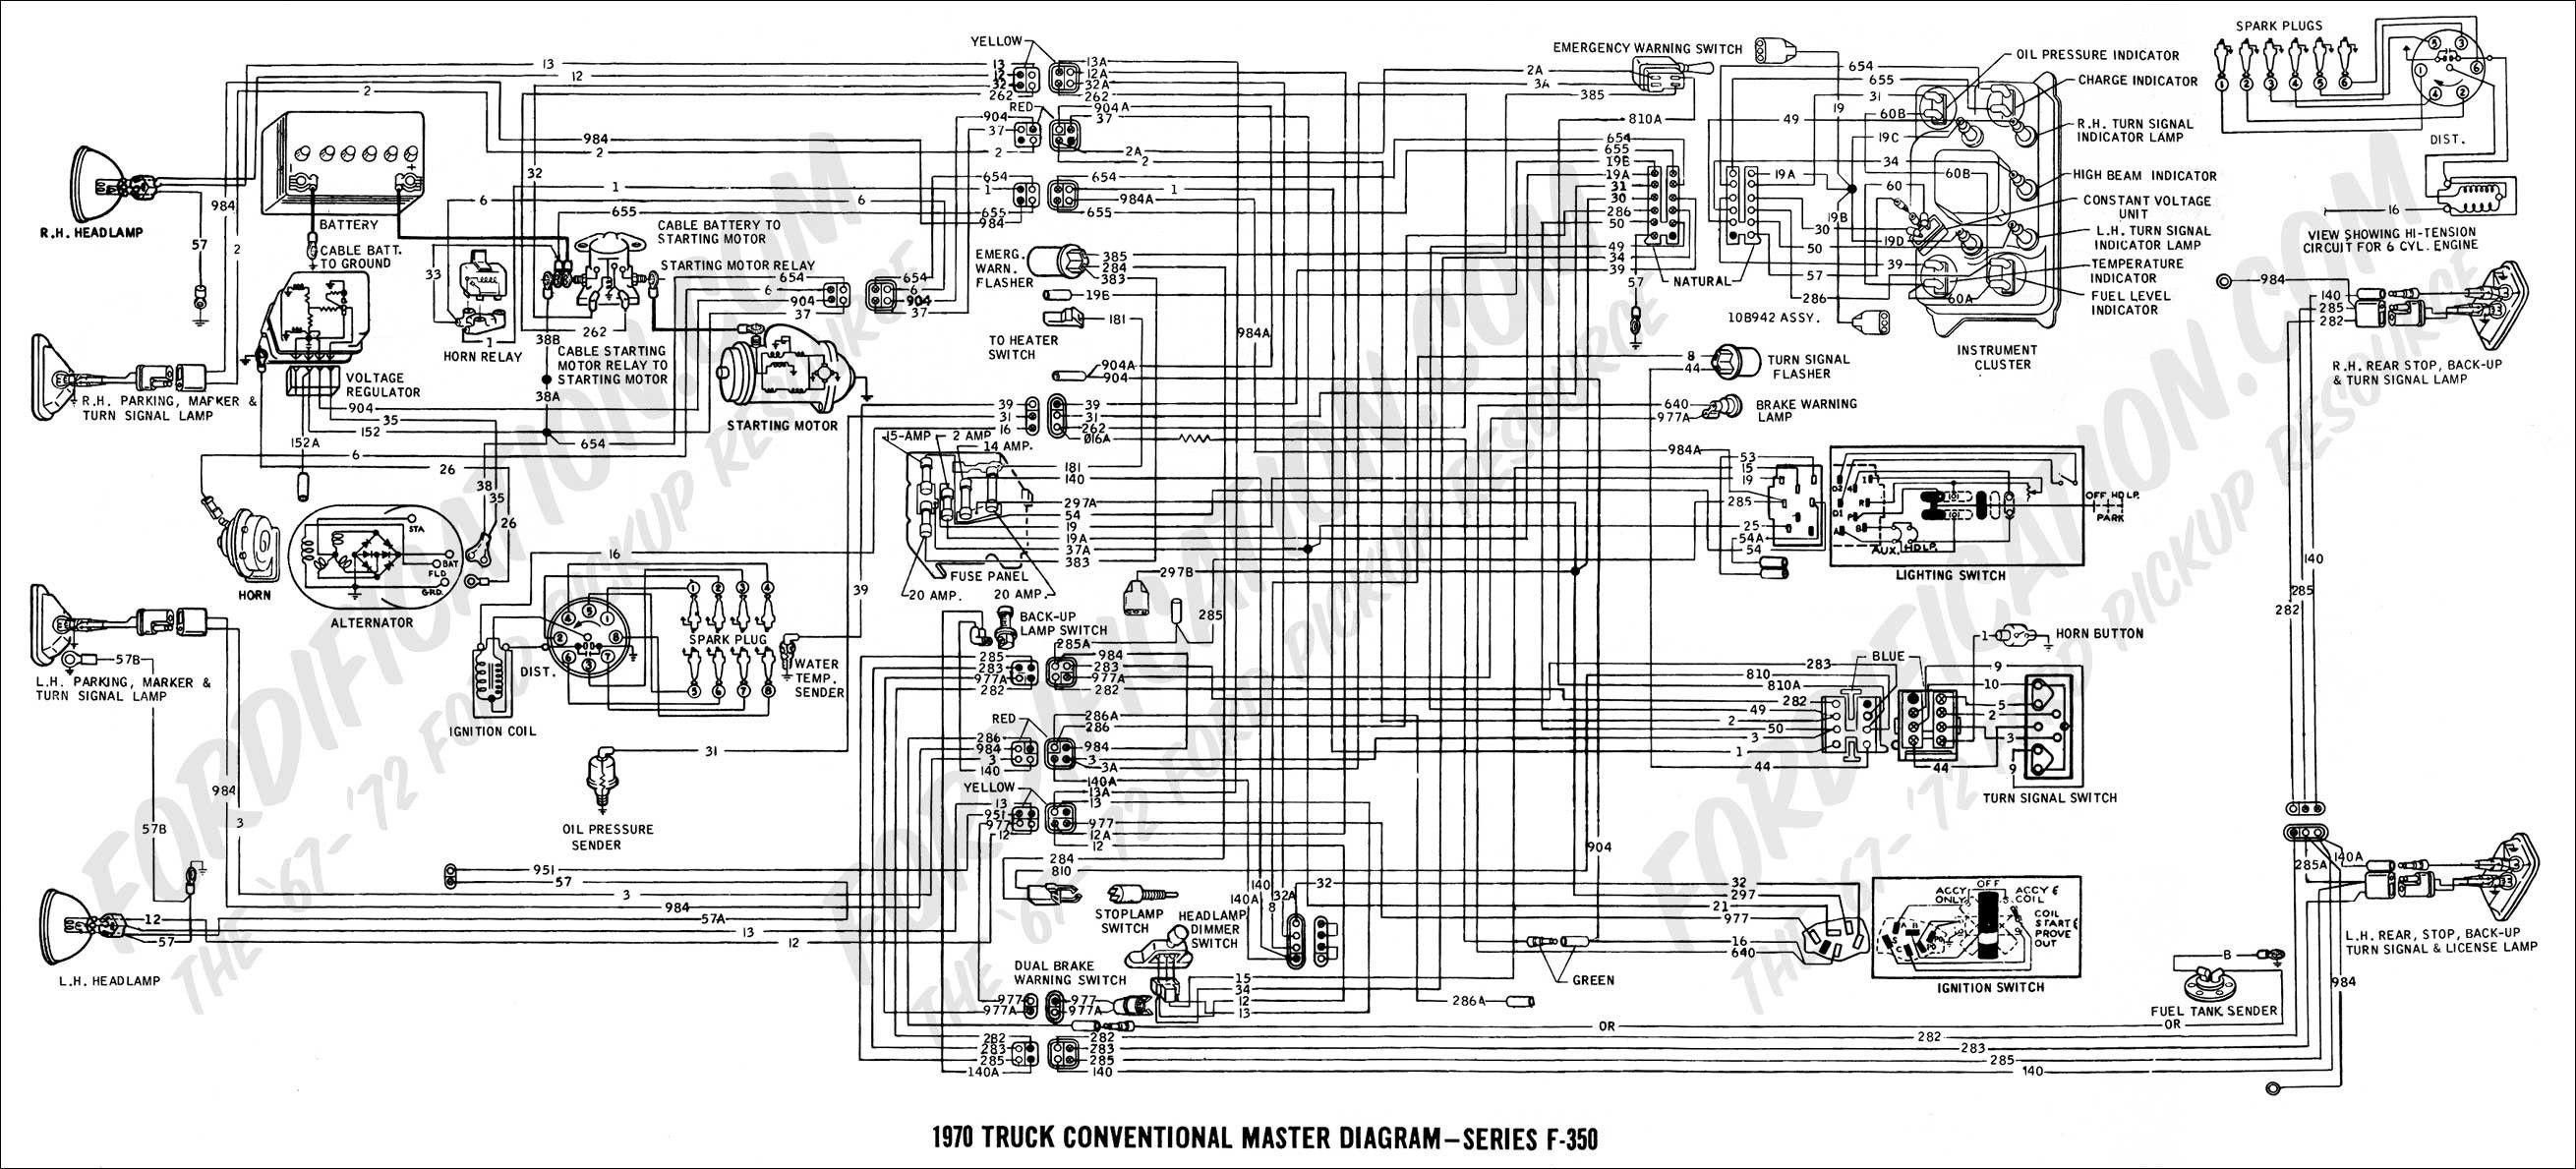 2001 Mitsubishi Eclipse Engine Diagram in 2021 | Ford ranger, Ford truck, Ford  f350 | Ford F350 Engine Diagram |  | Pinterest